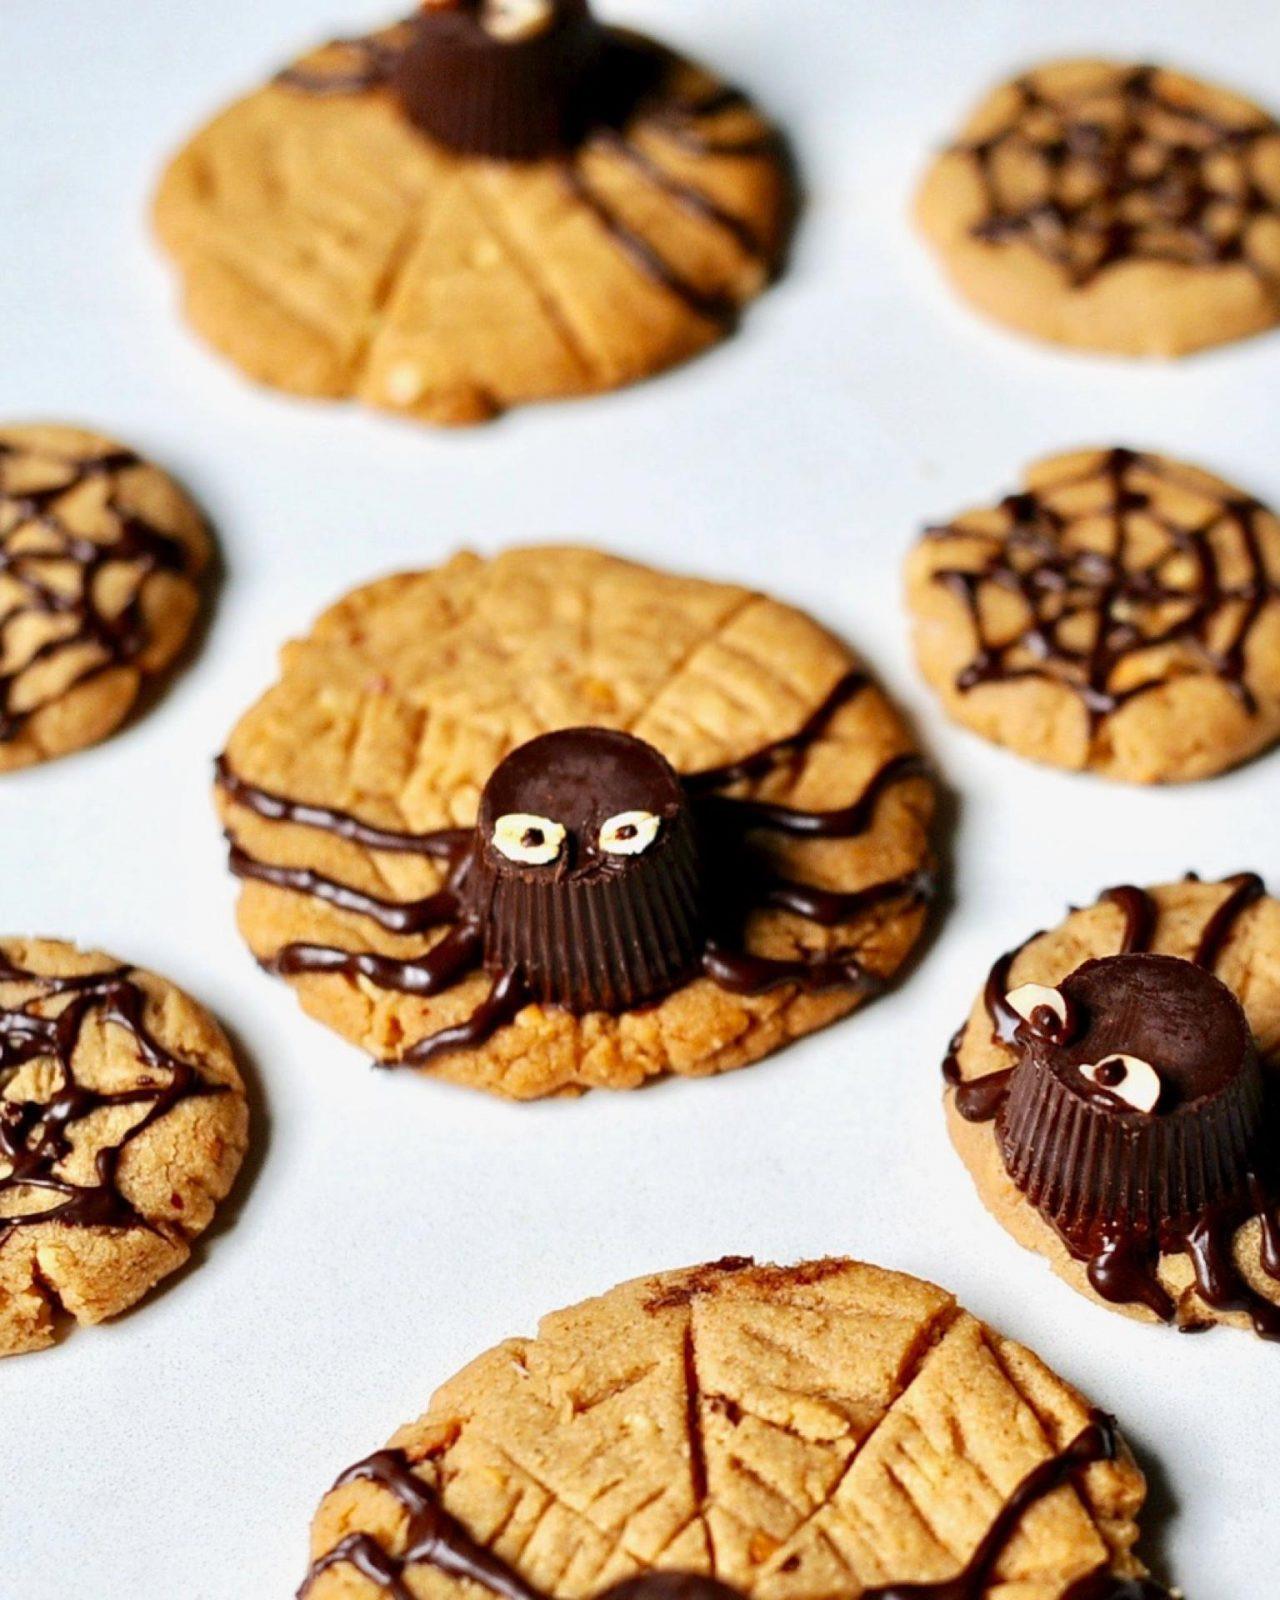 Gluten Free Halloween Cookies  Peanut Butter Spider Cookies for Halloween Vegan Gluten